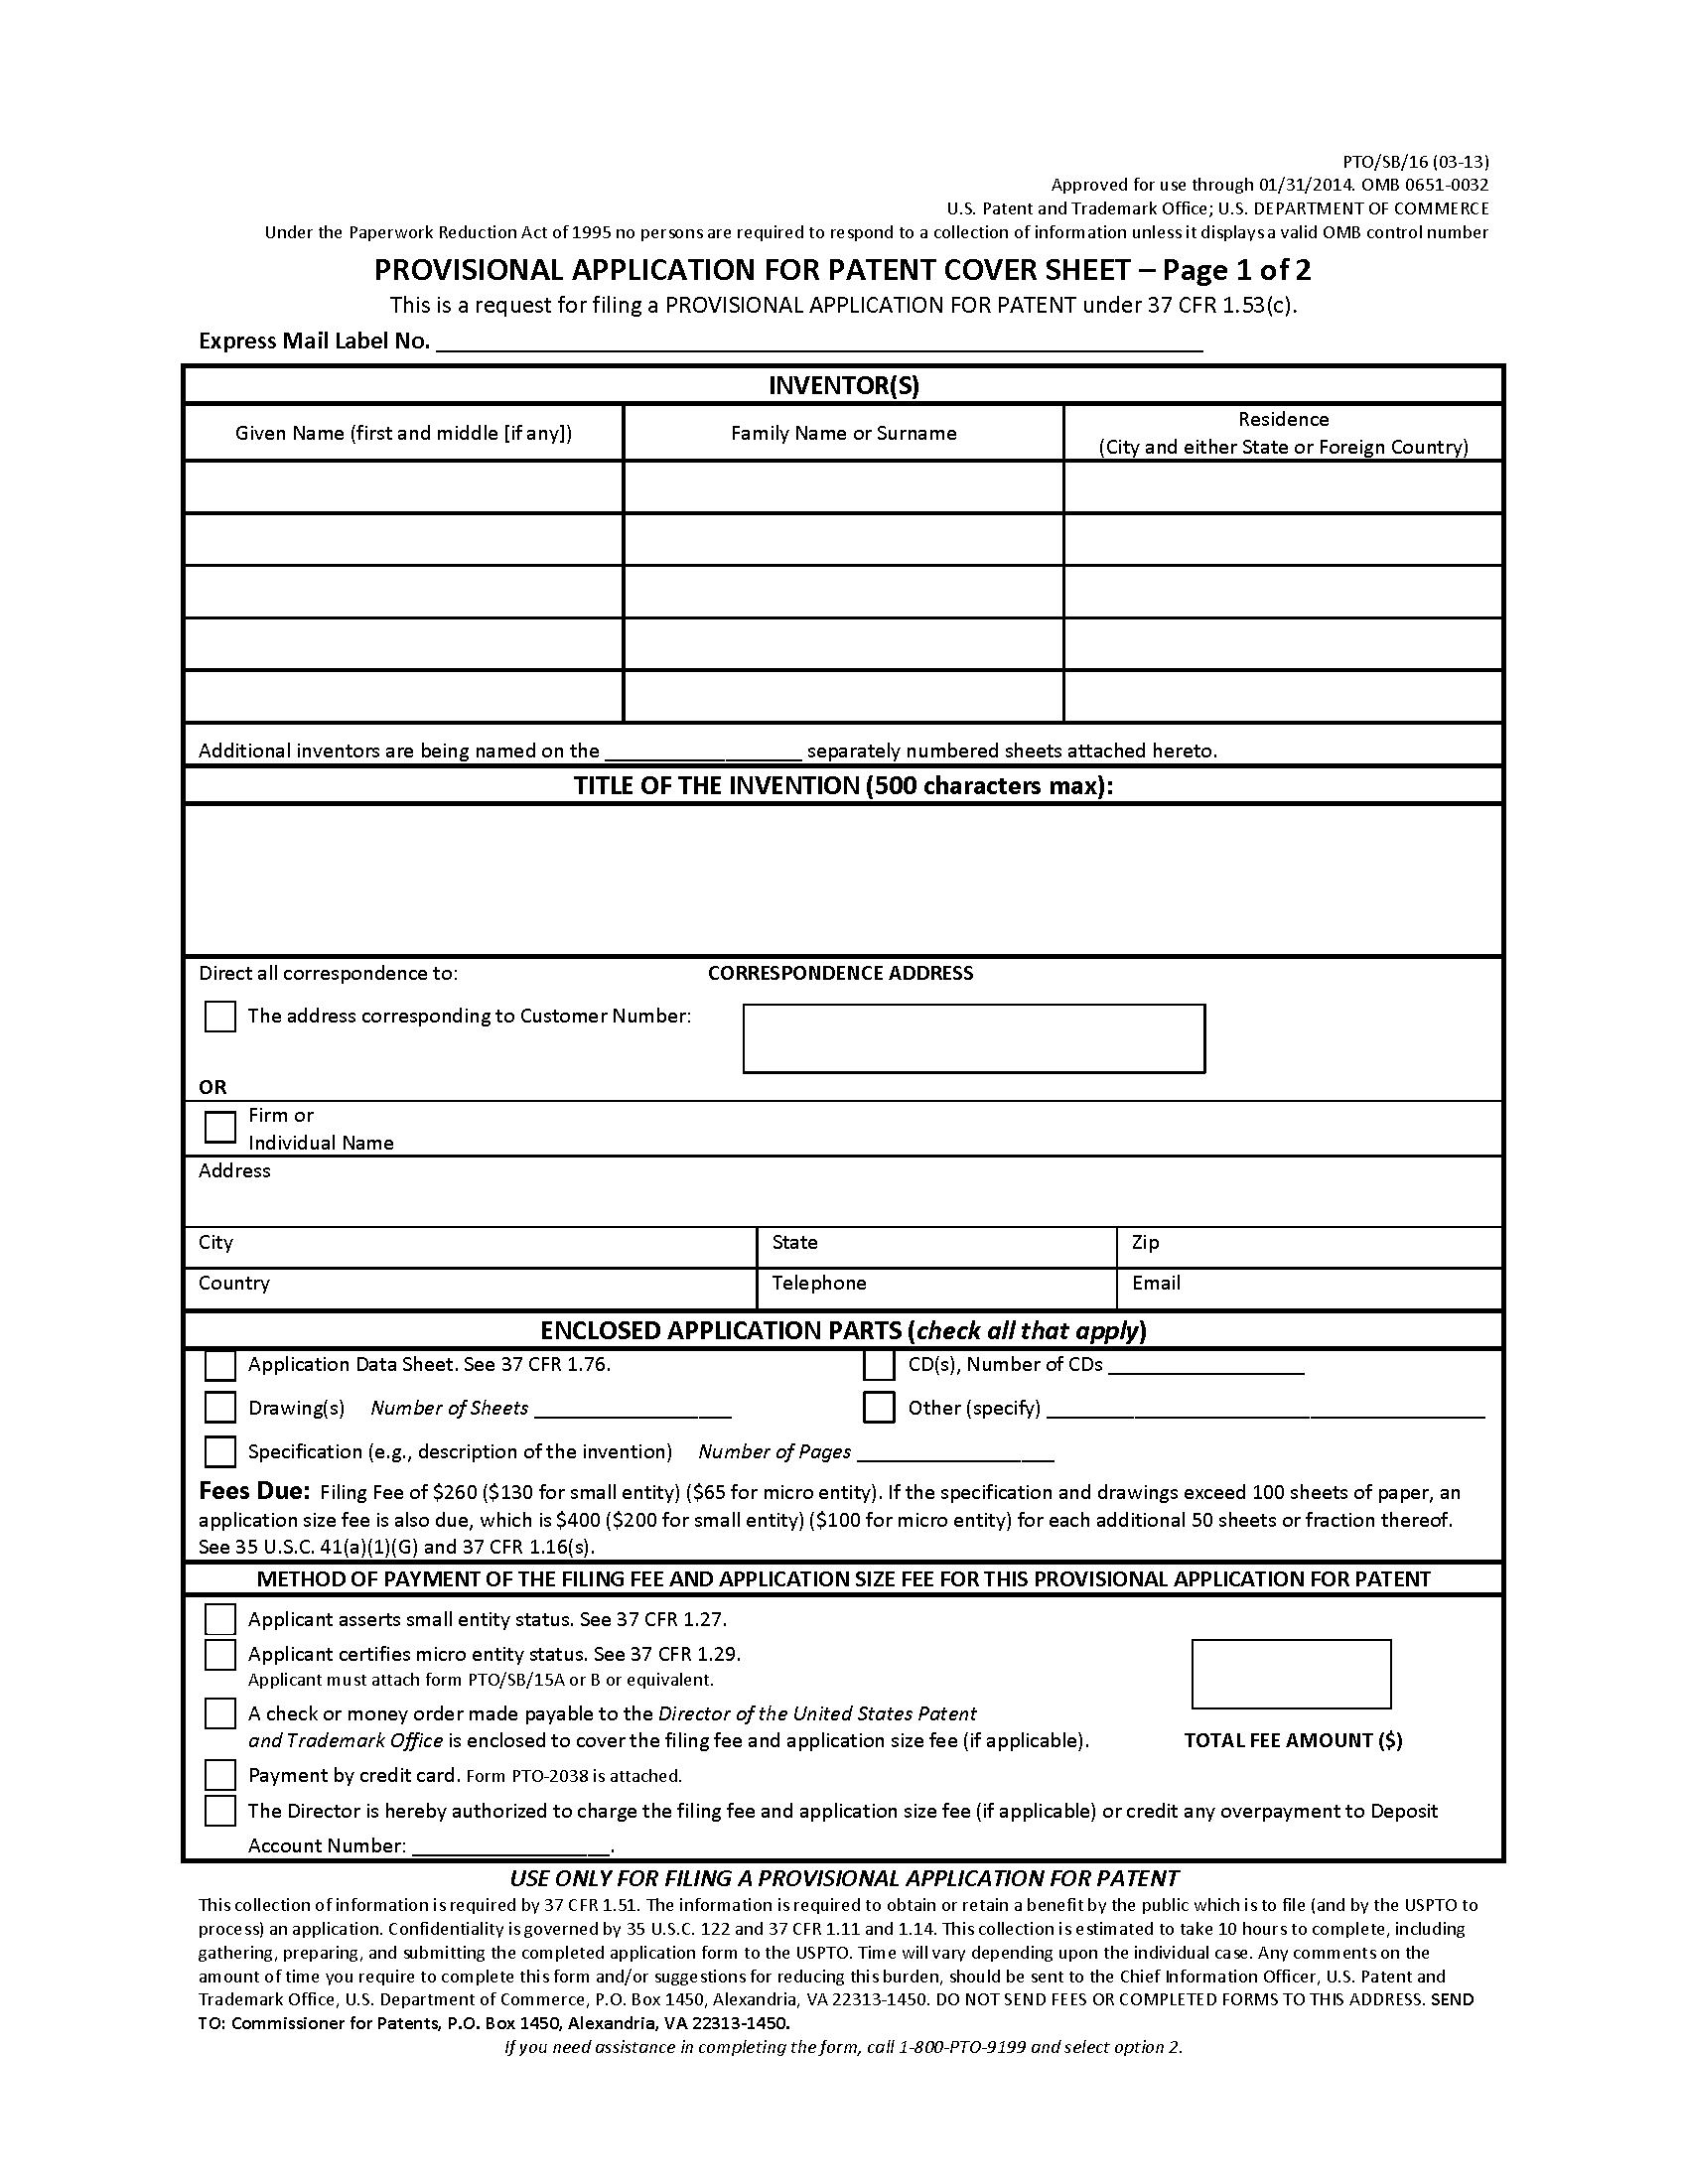 MPEP 201.04: Provisional Application, Nov. 2015 (BitLaw)